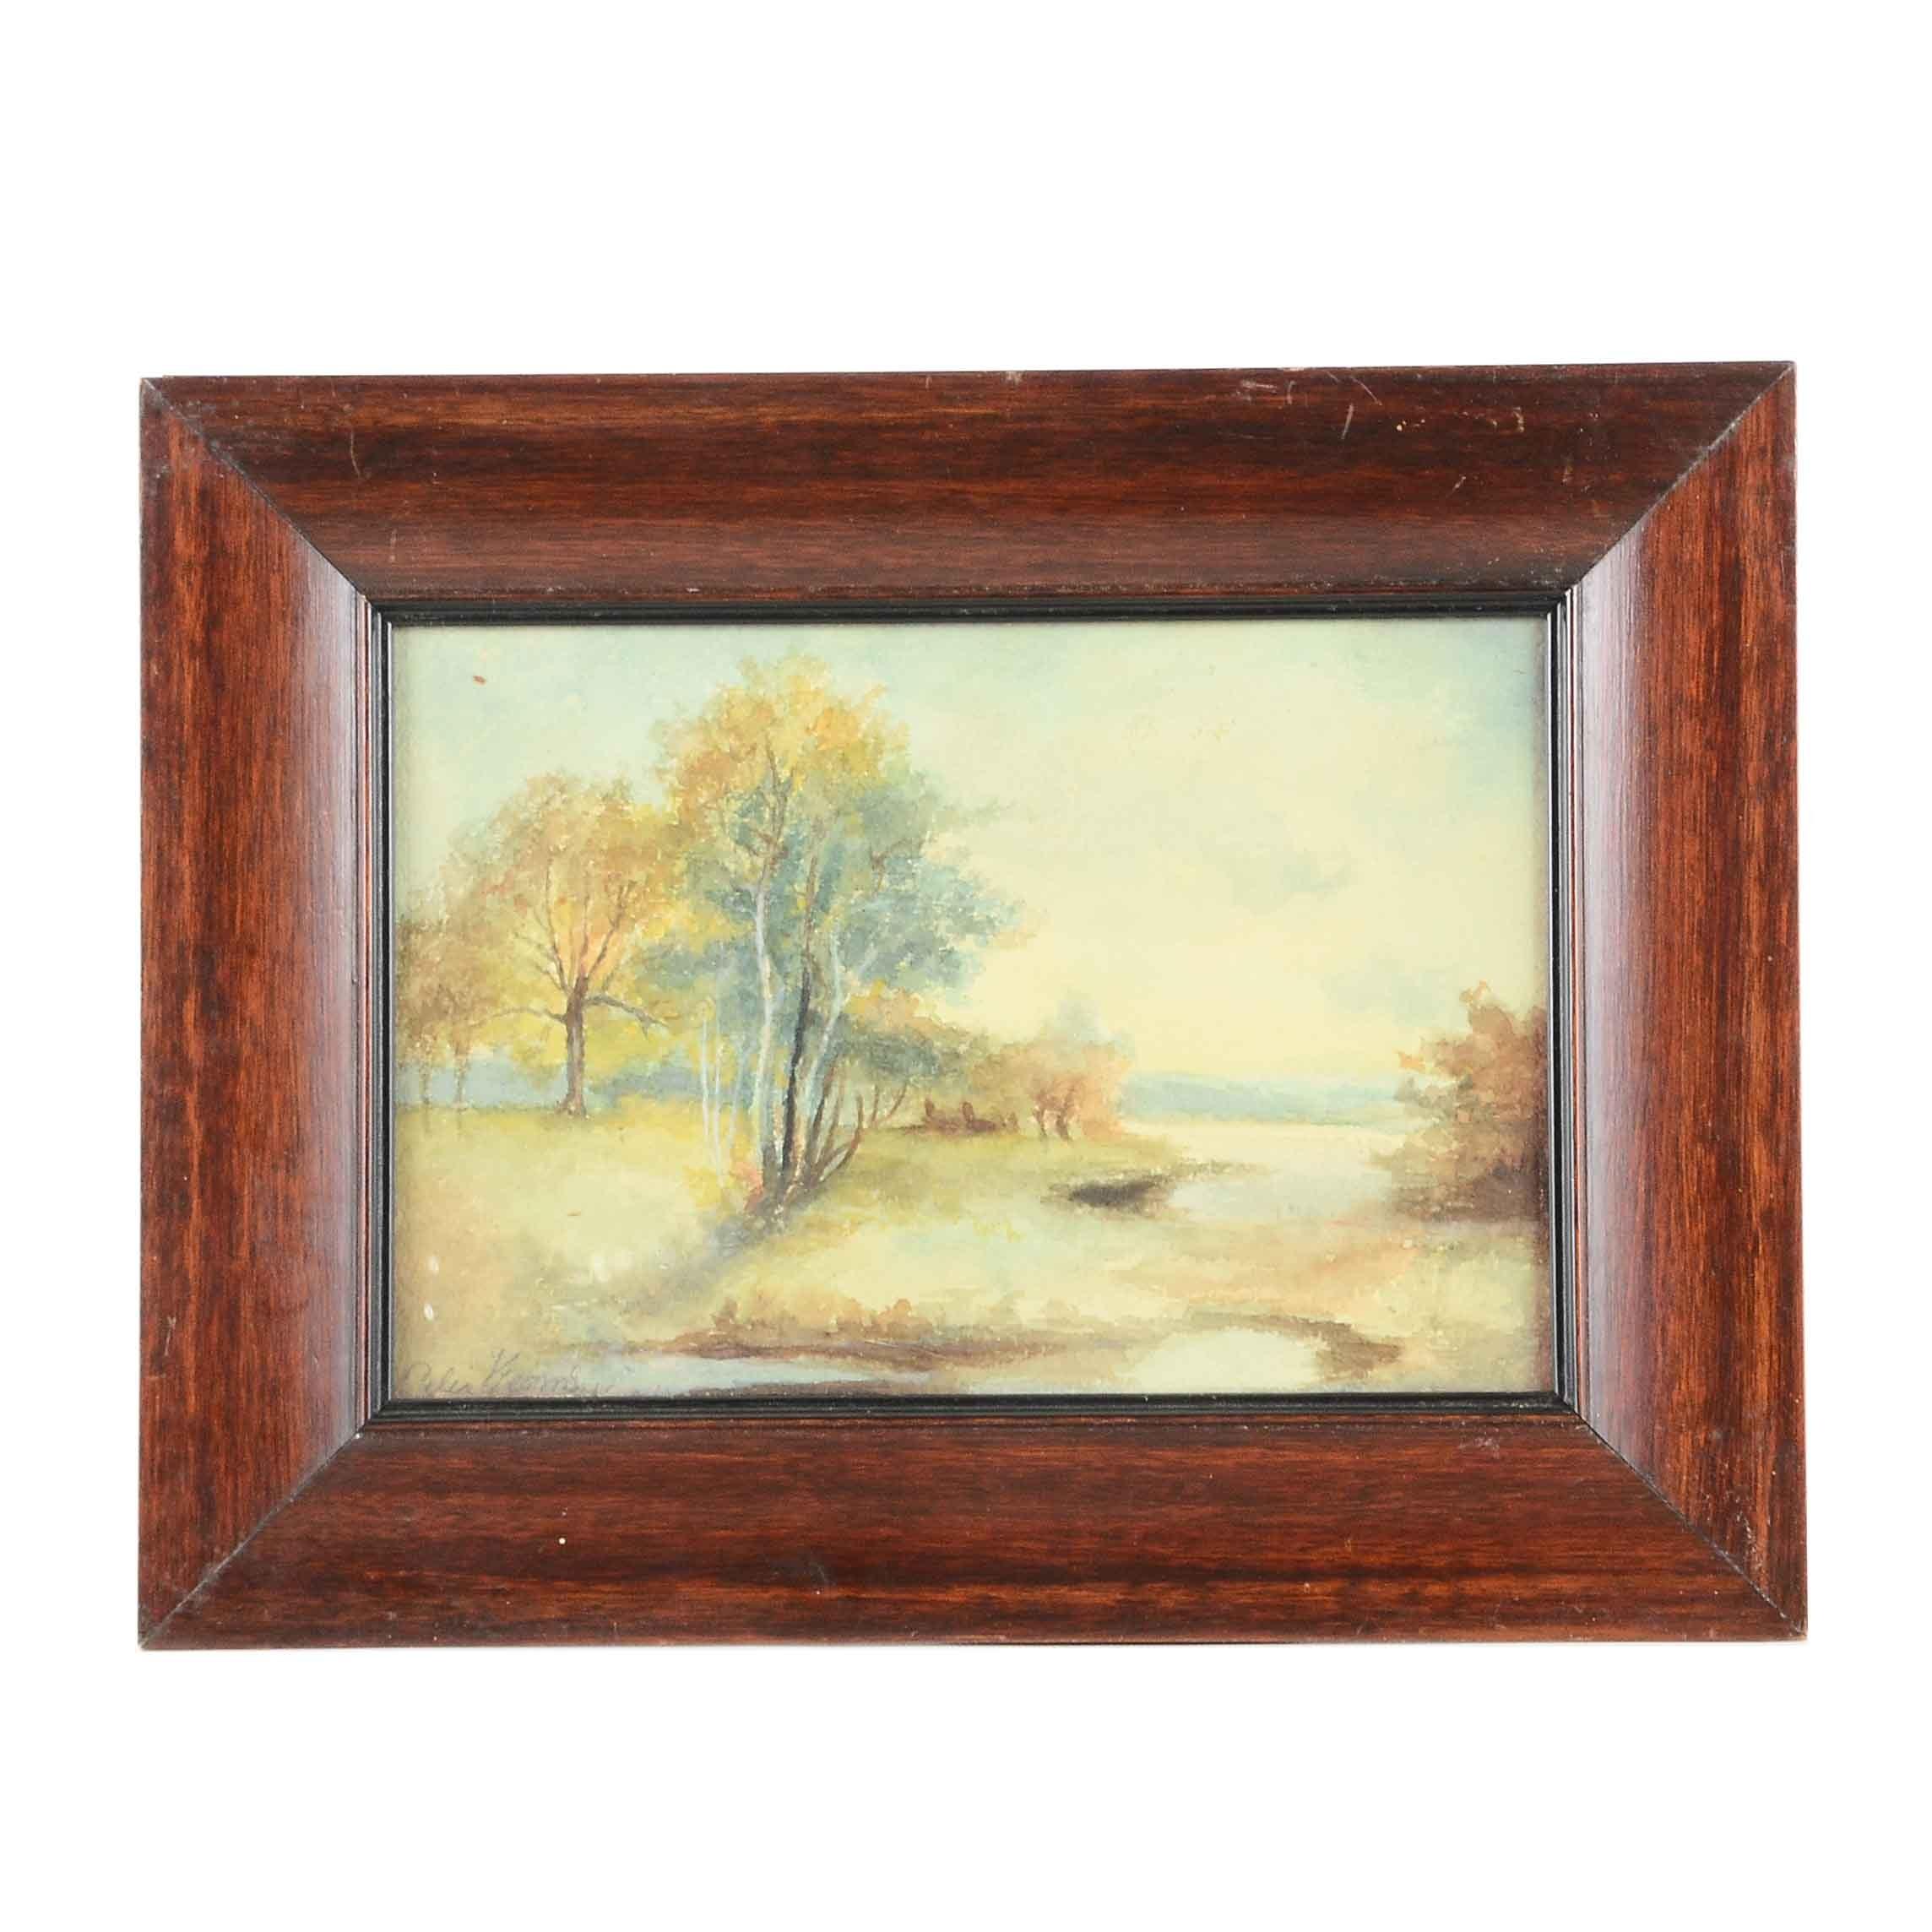 Celia V. Watercolor of a Landscape